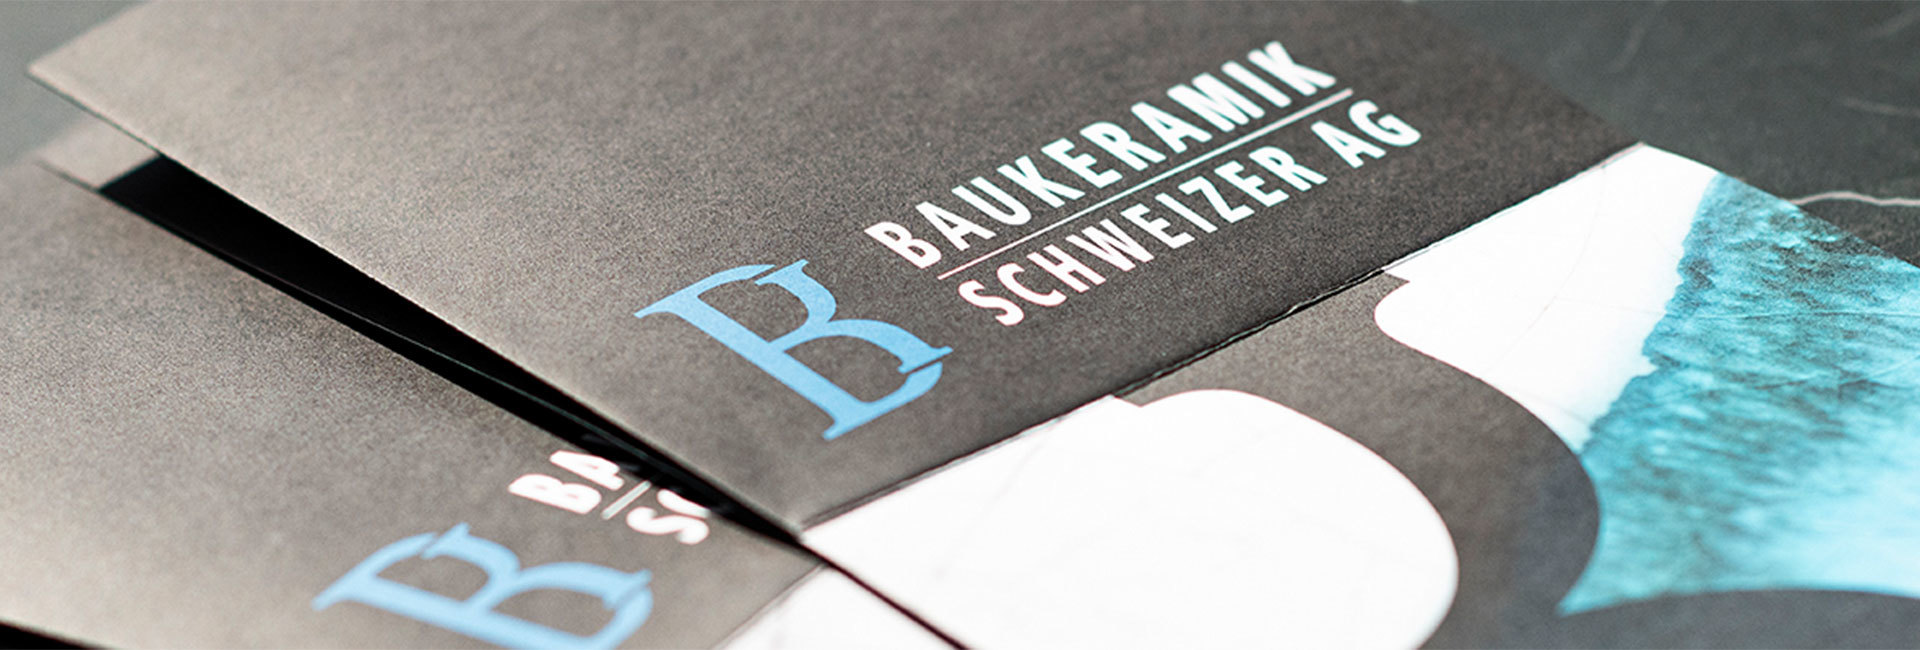 Sitemap - Baukeramik Schweizer AG